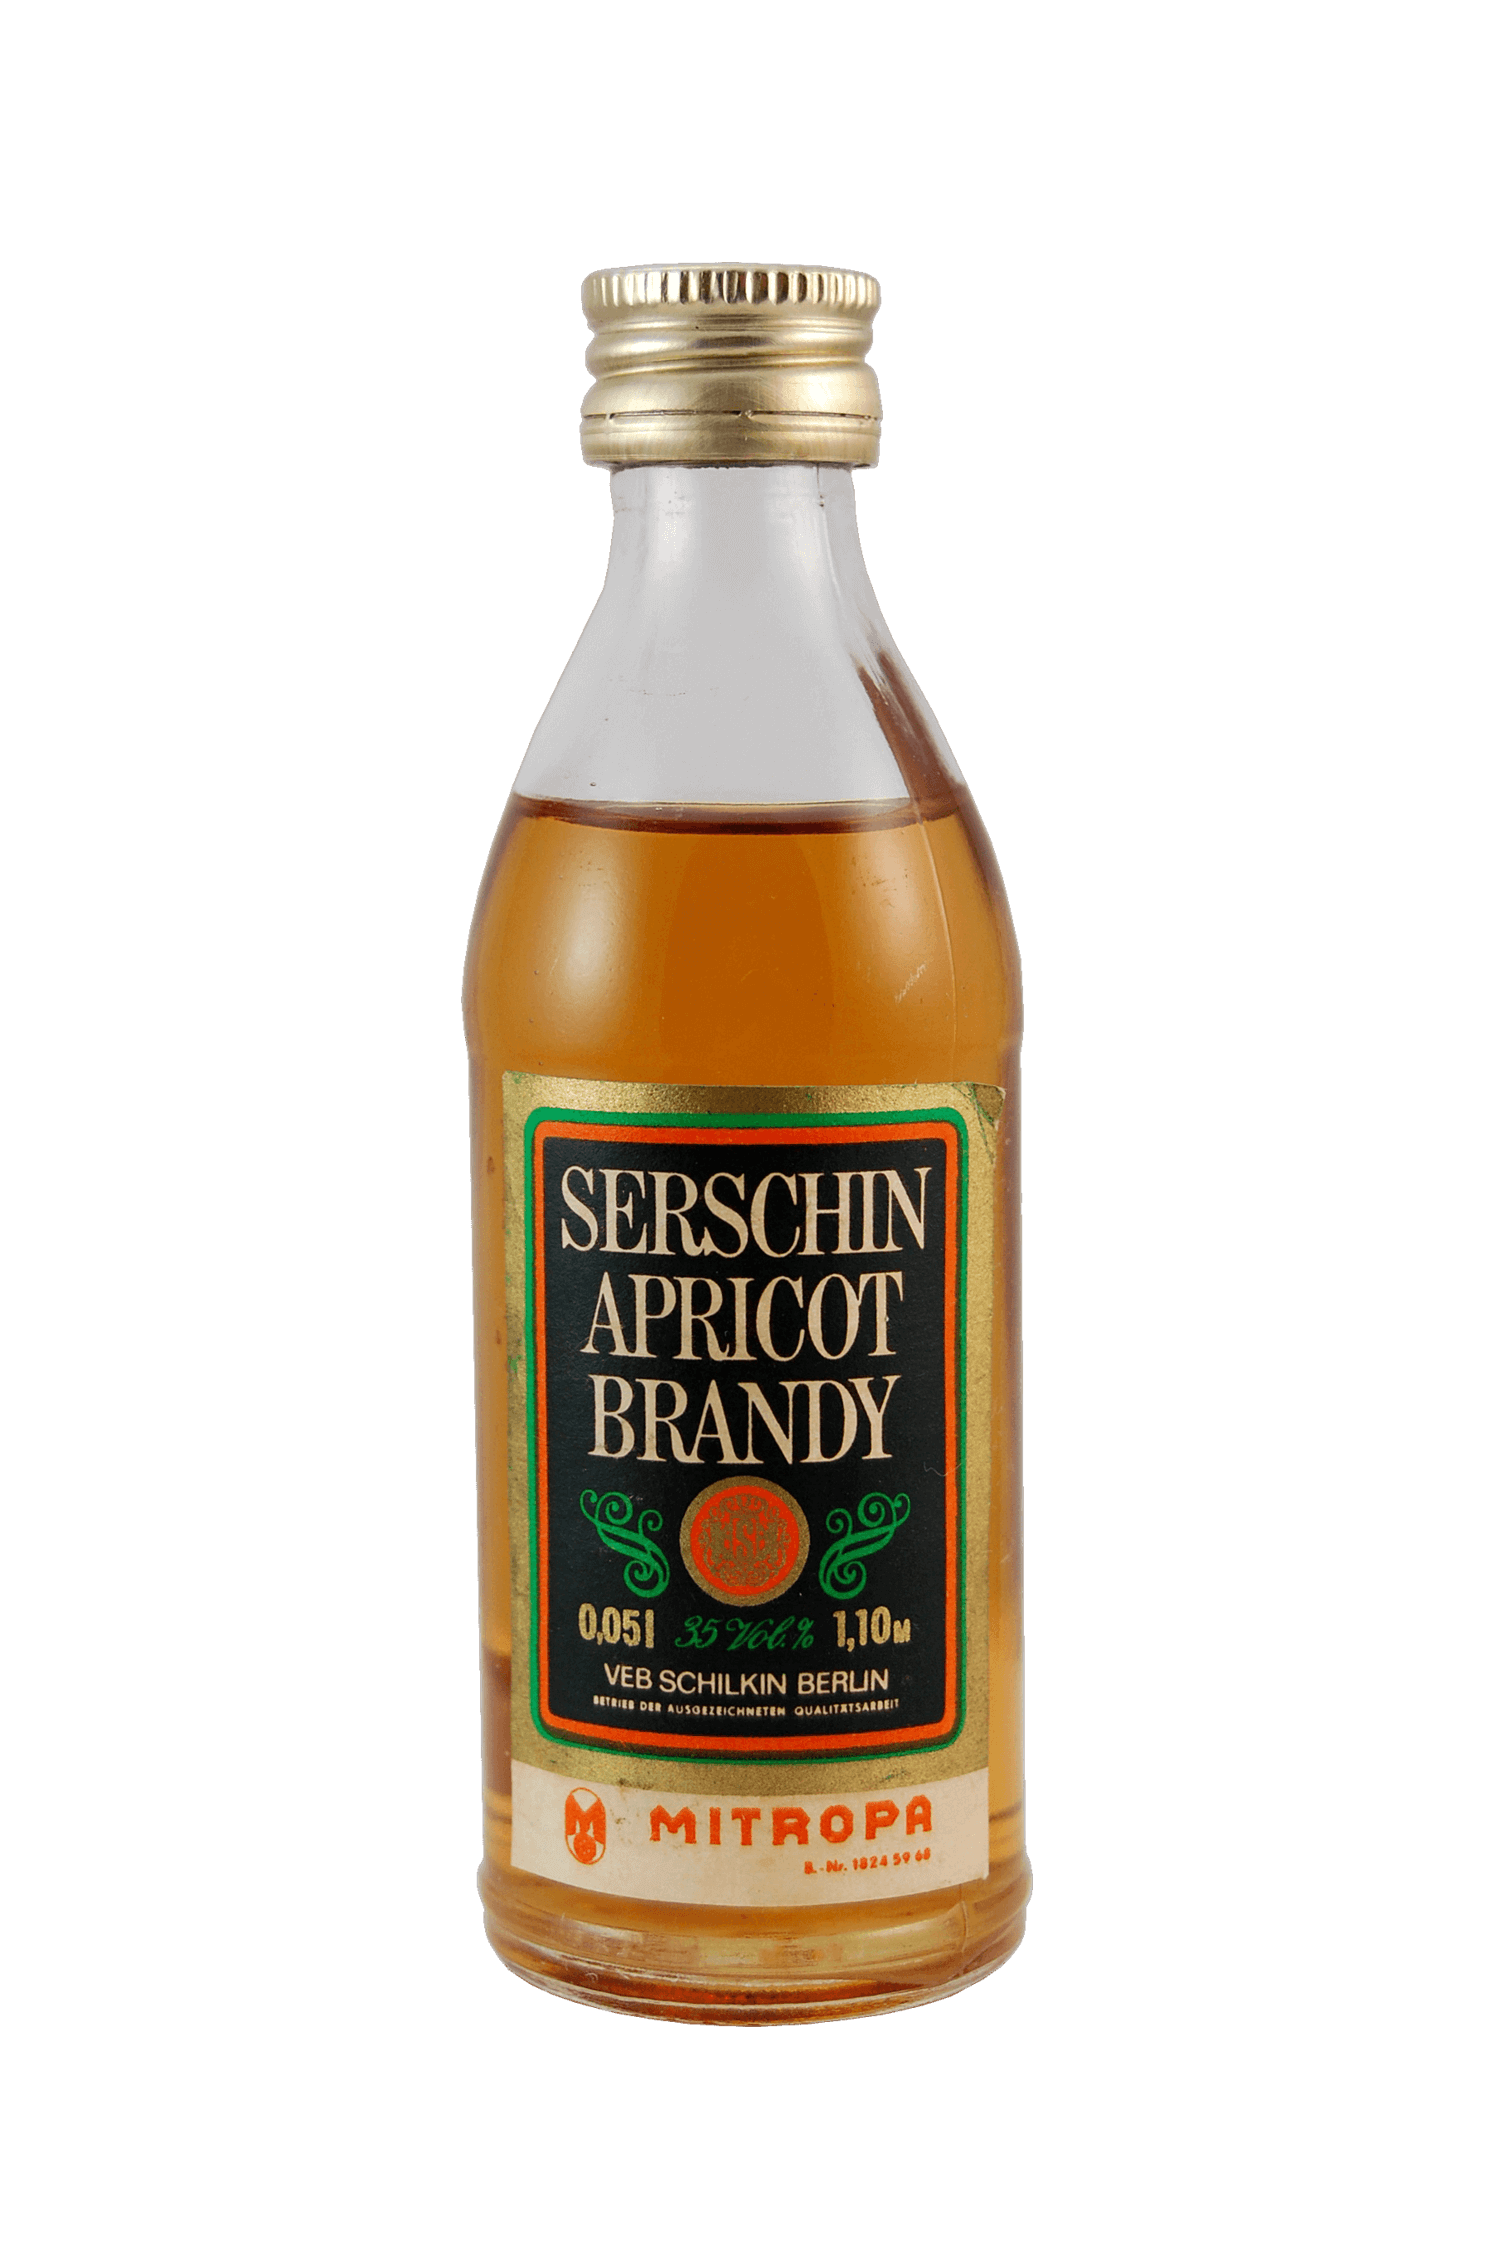 Serschin Apricot Brandy